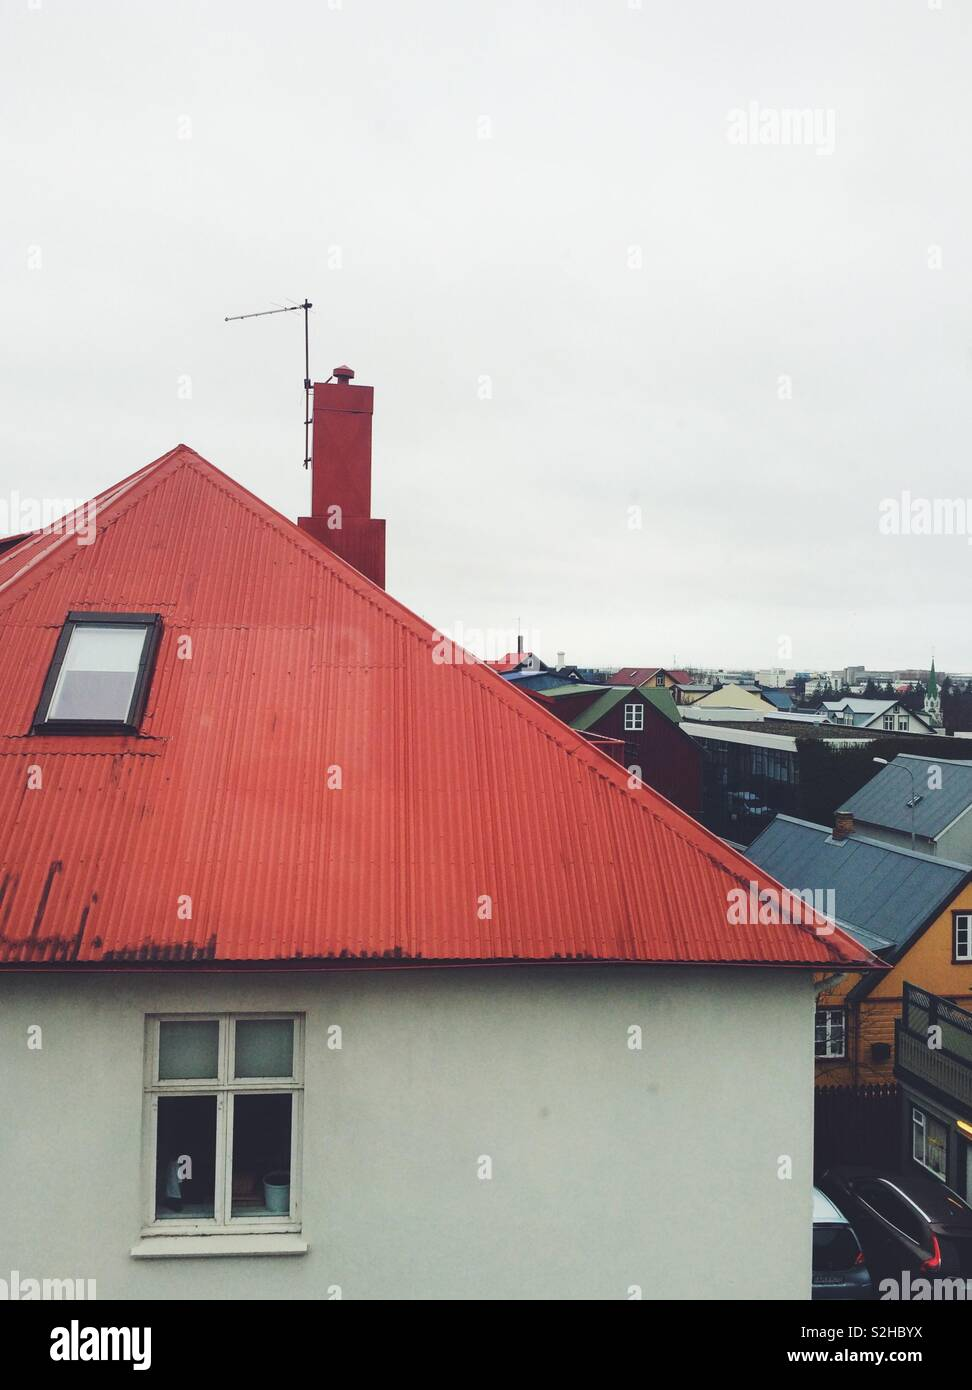 Vues loft islandais Photo Stock